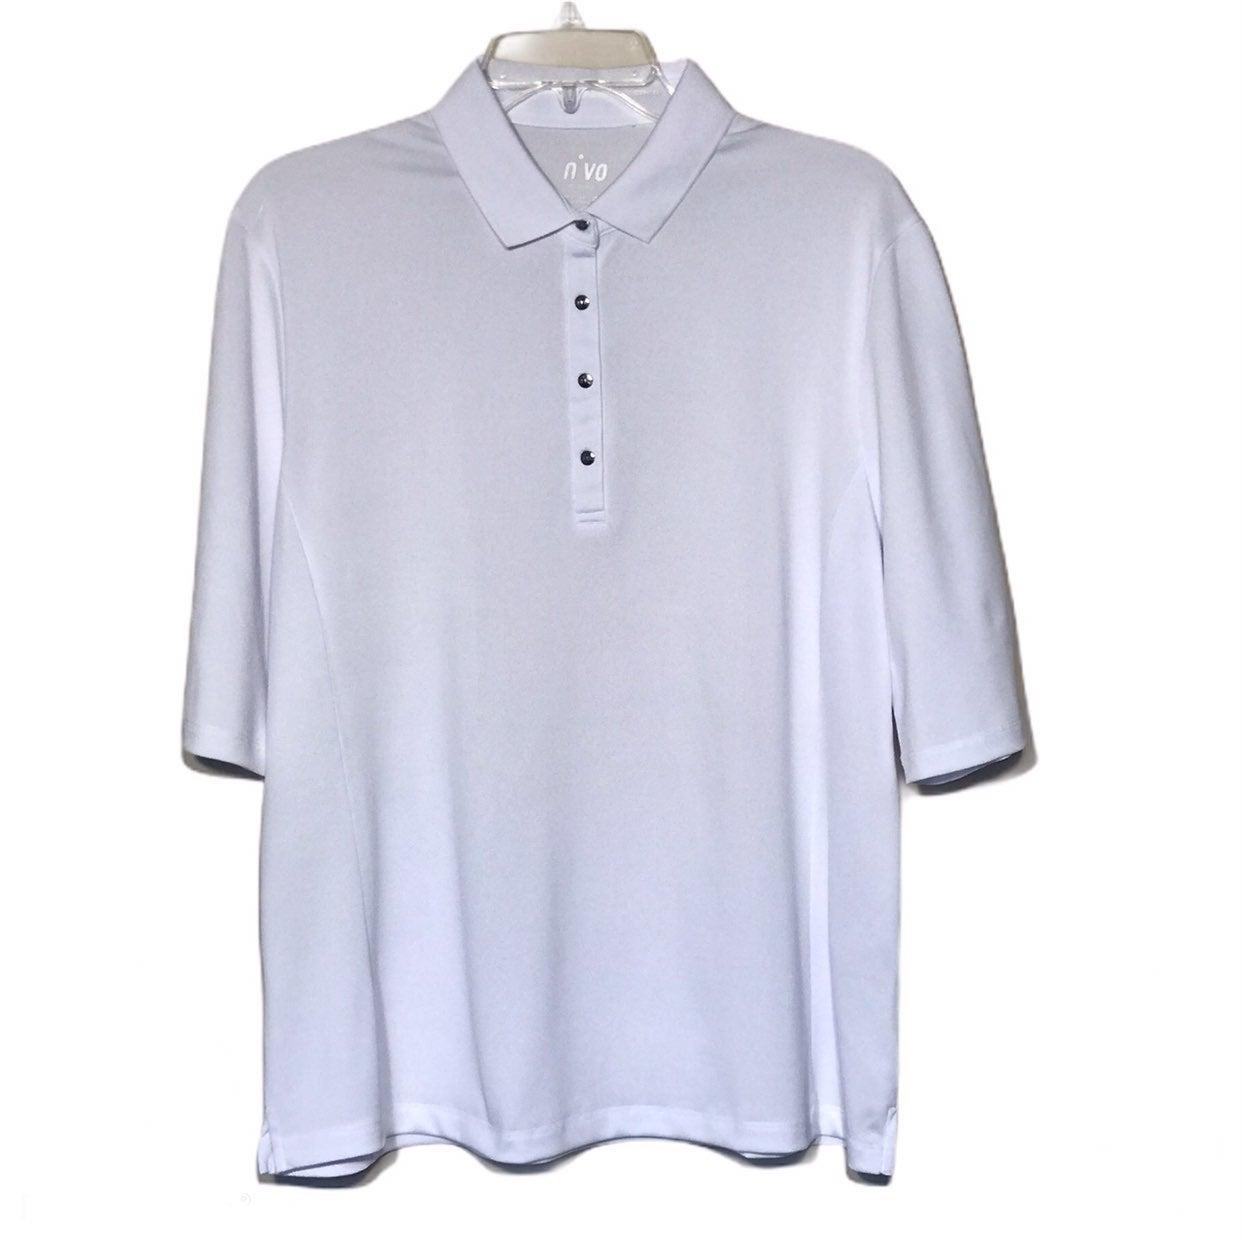 Nivo White Elbow Length Golf Top NWOT